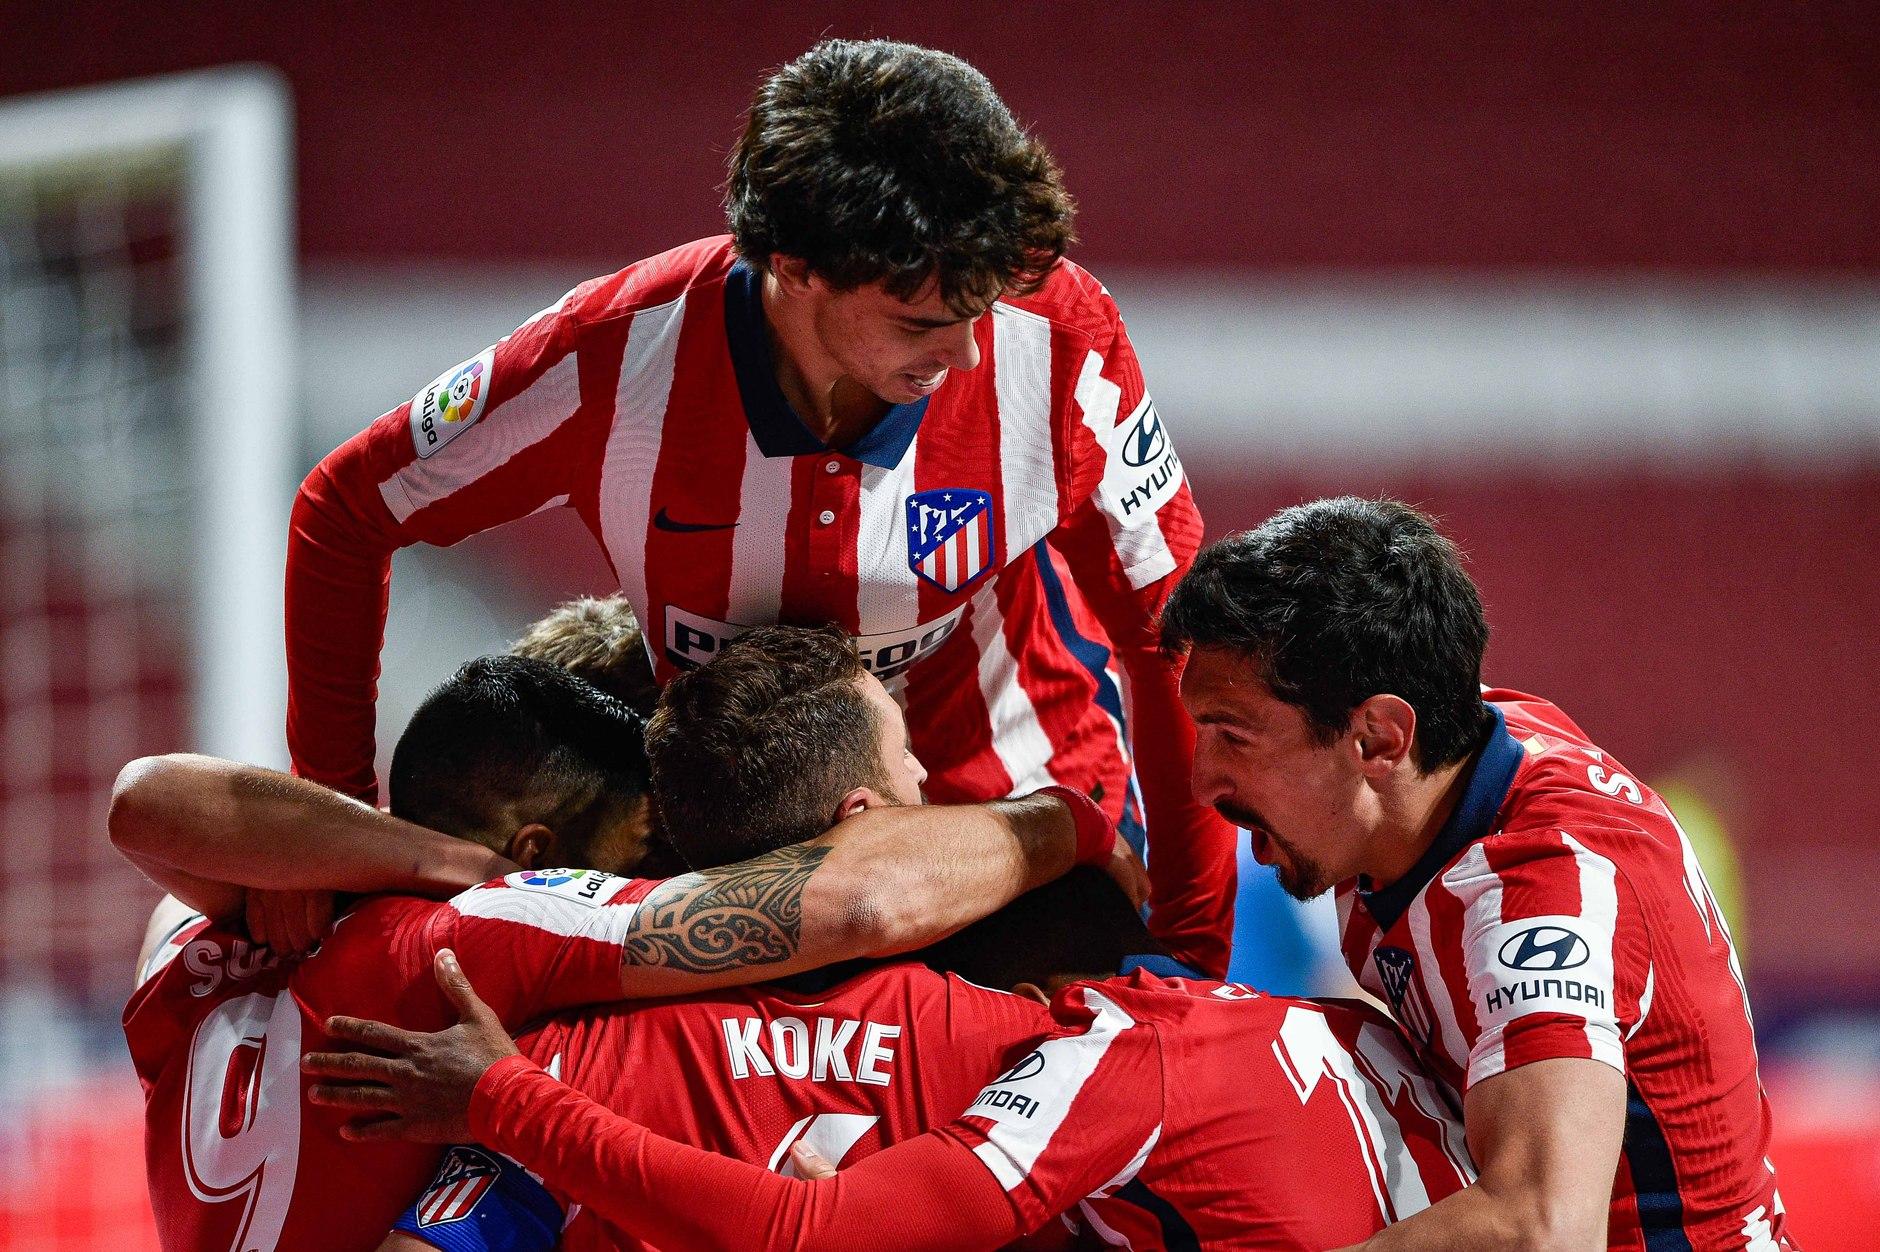 Sufrida victoria del Atlético de Madrid. Foto: Twitter